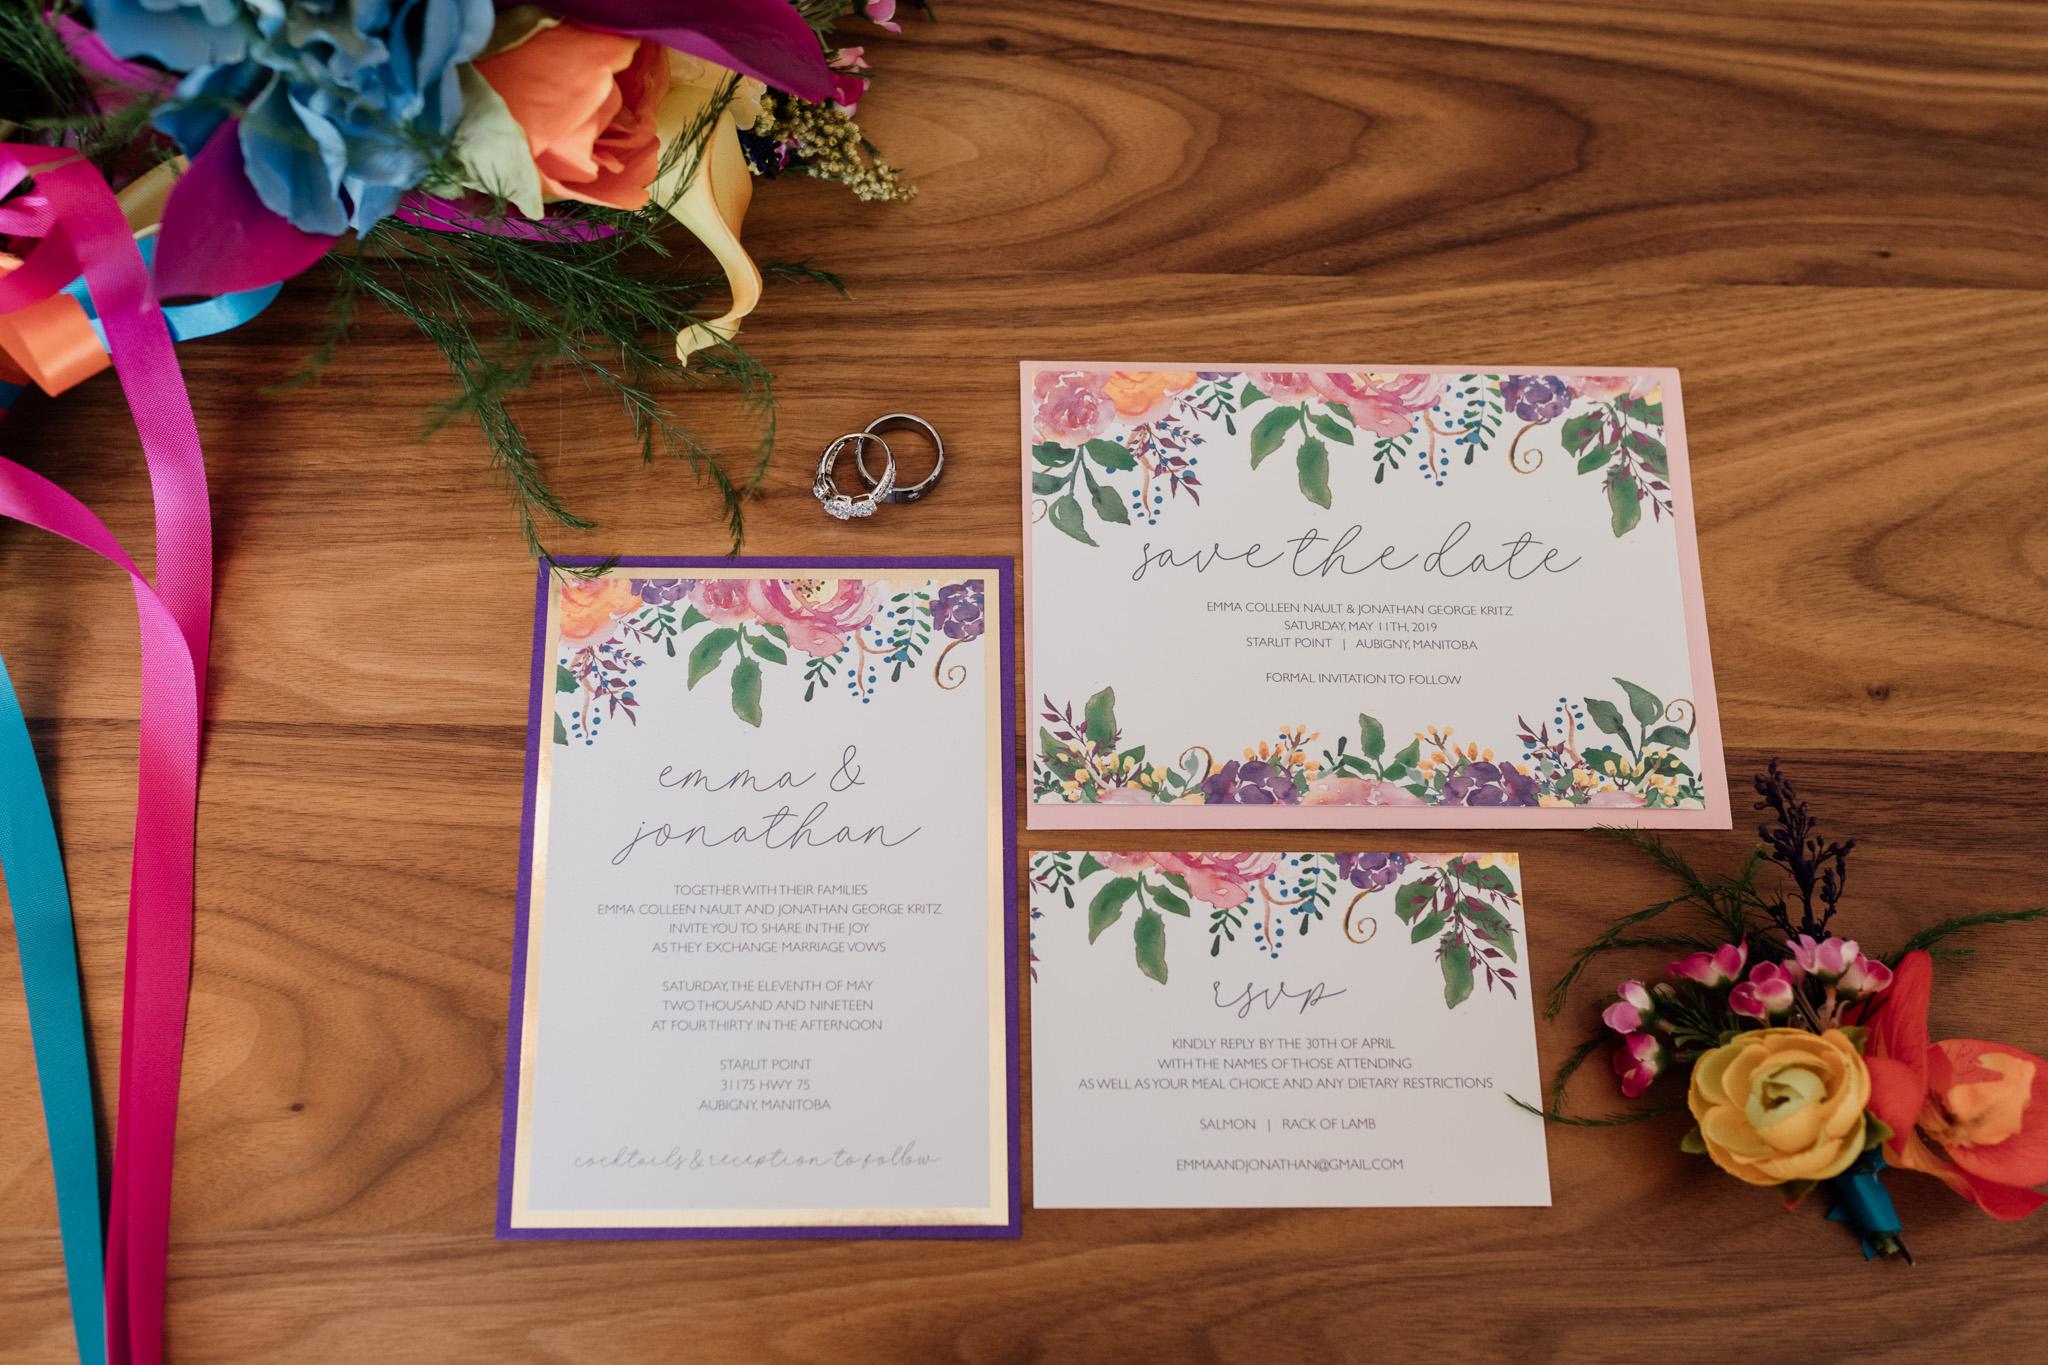 winnipeg-wedding-starlit point-3.jpg